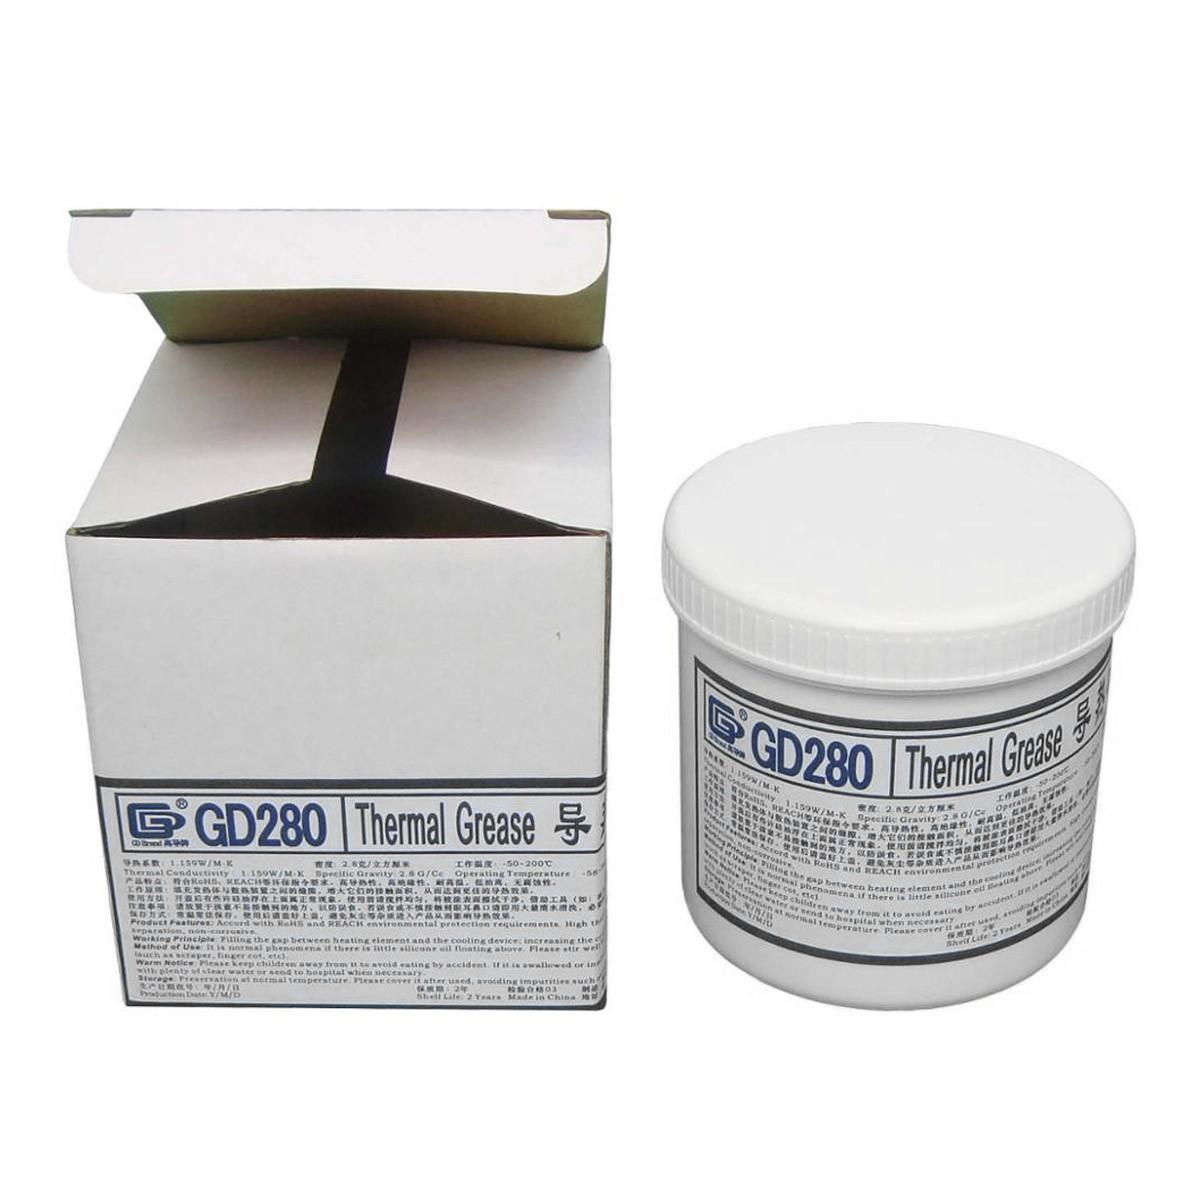 GD280 Thermal Paste Jar 150g